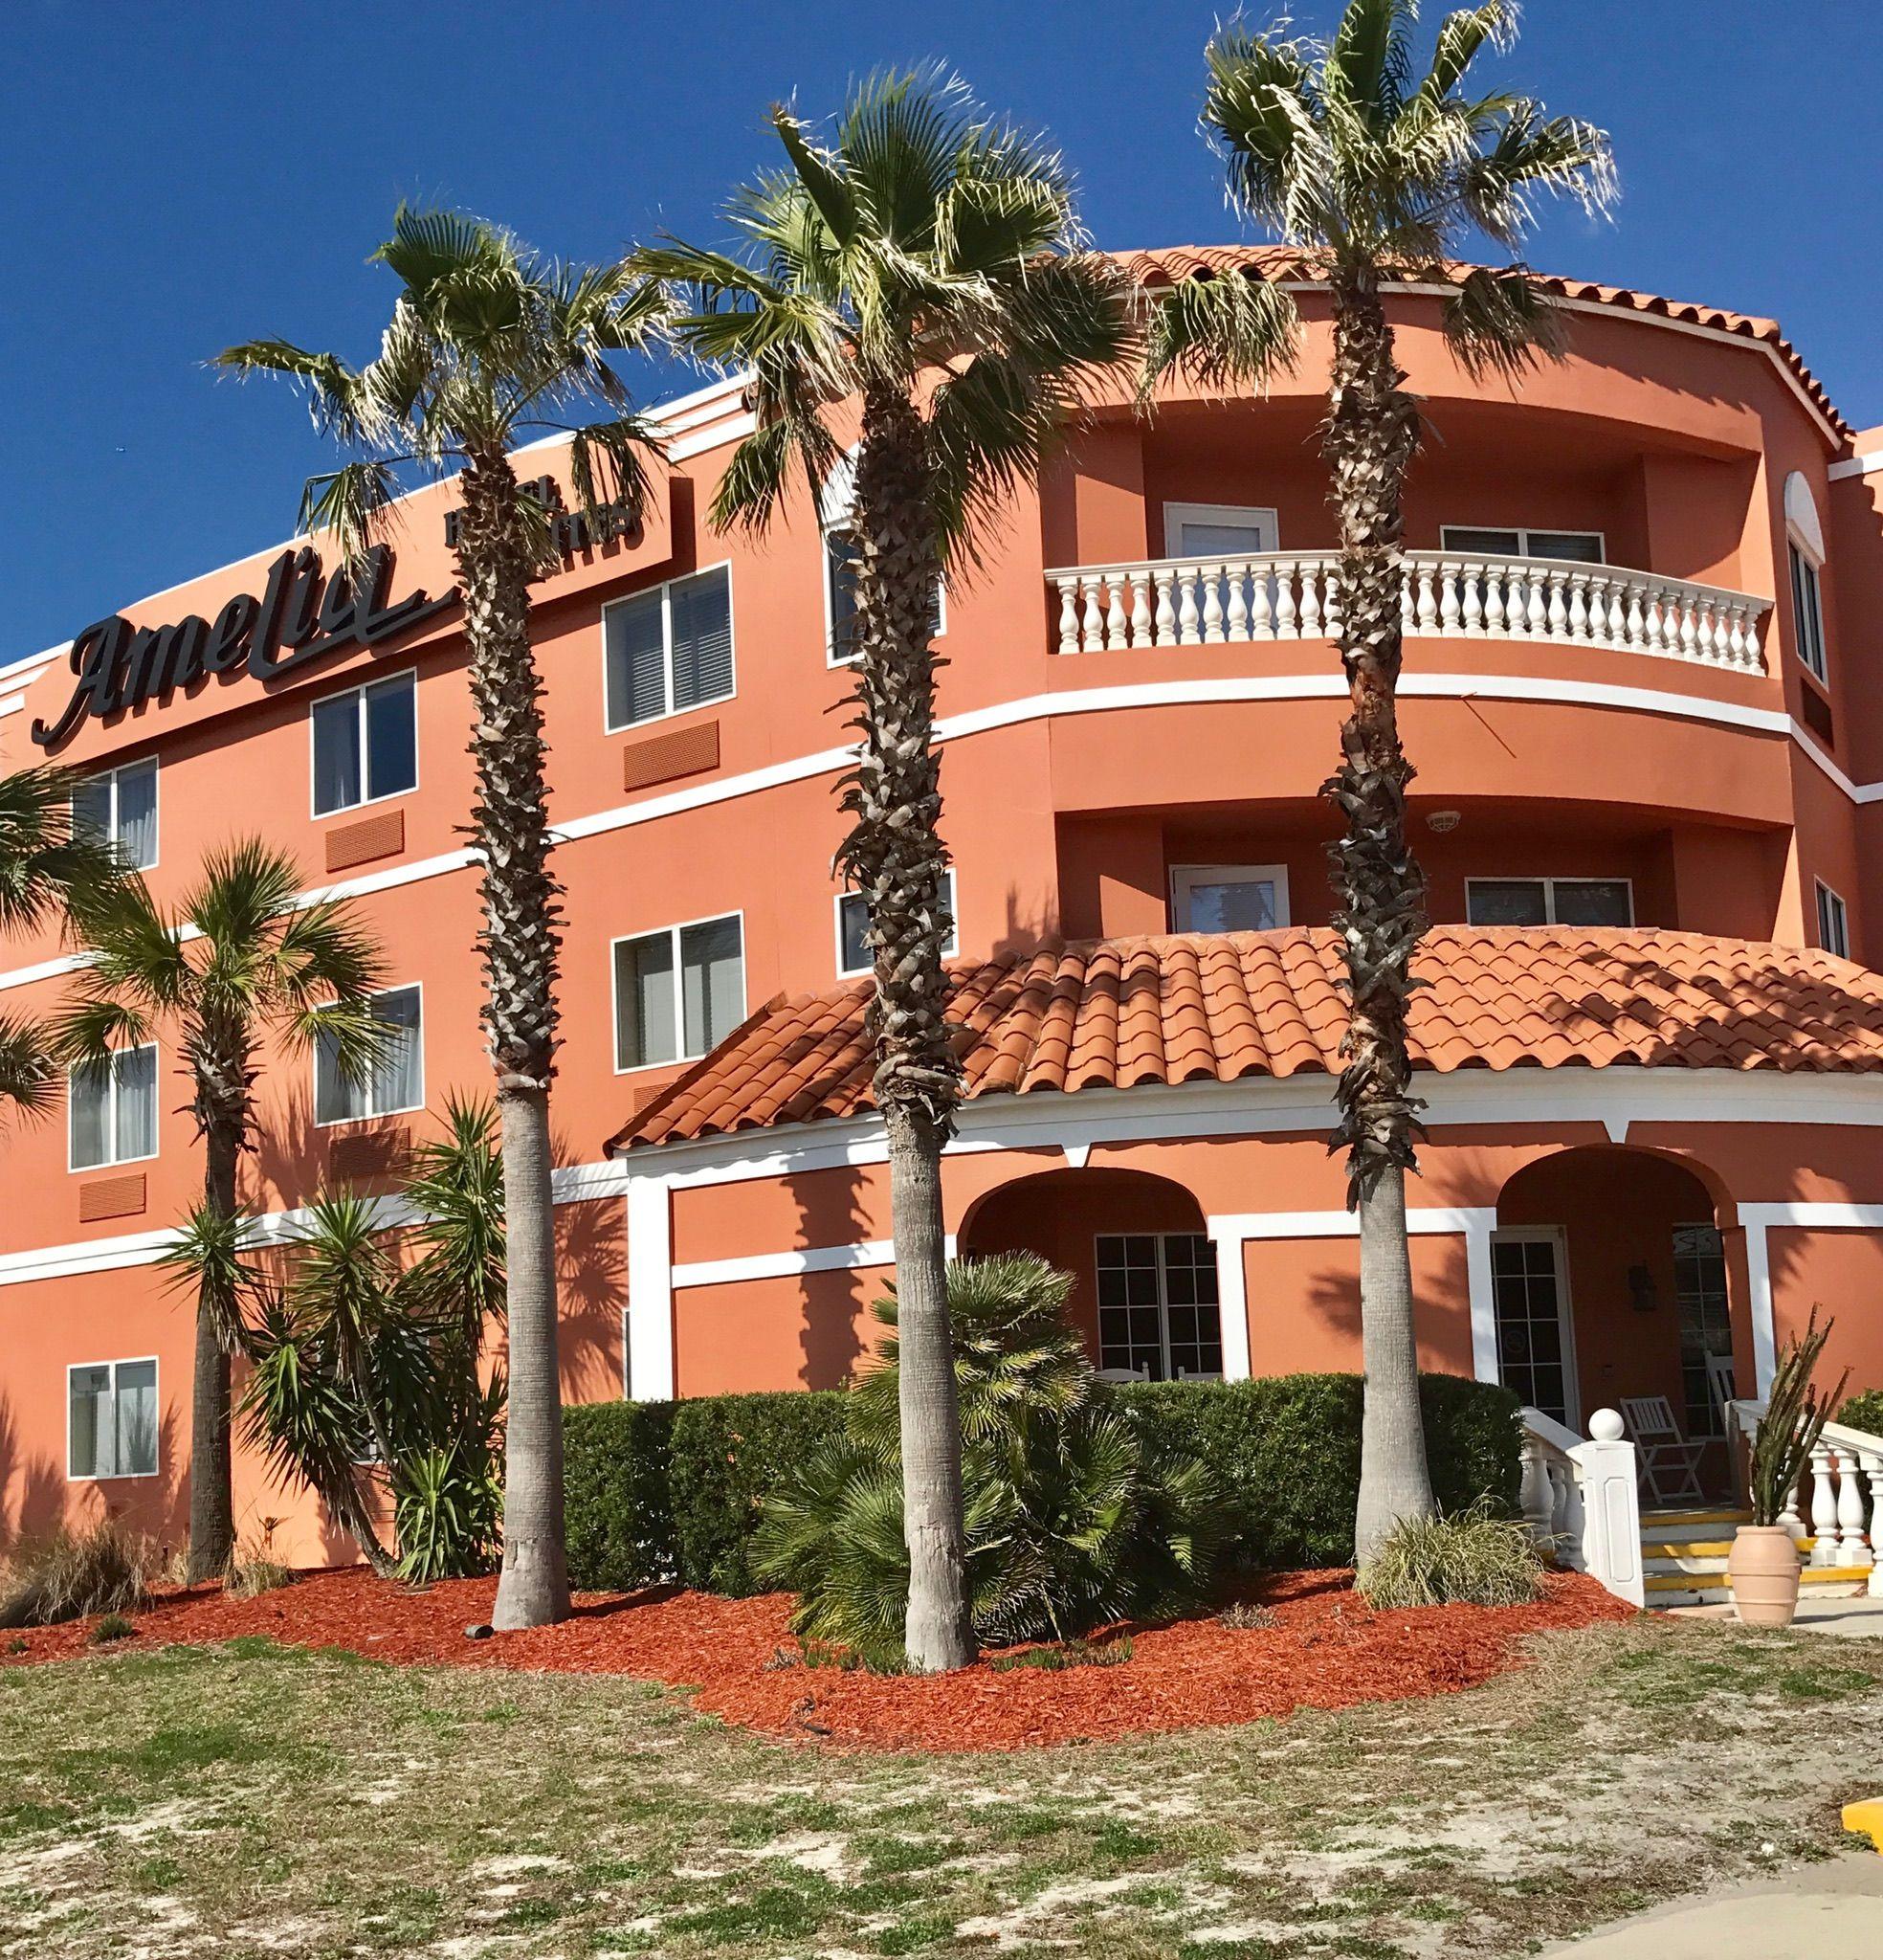 Island Inn, Florida Hotels, Amelia Island